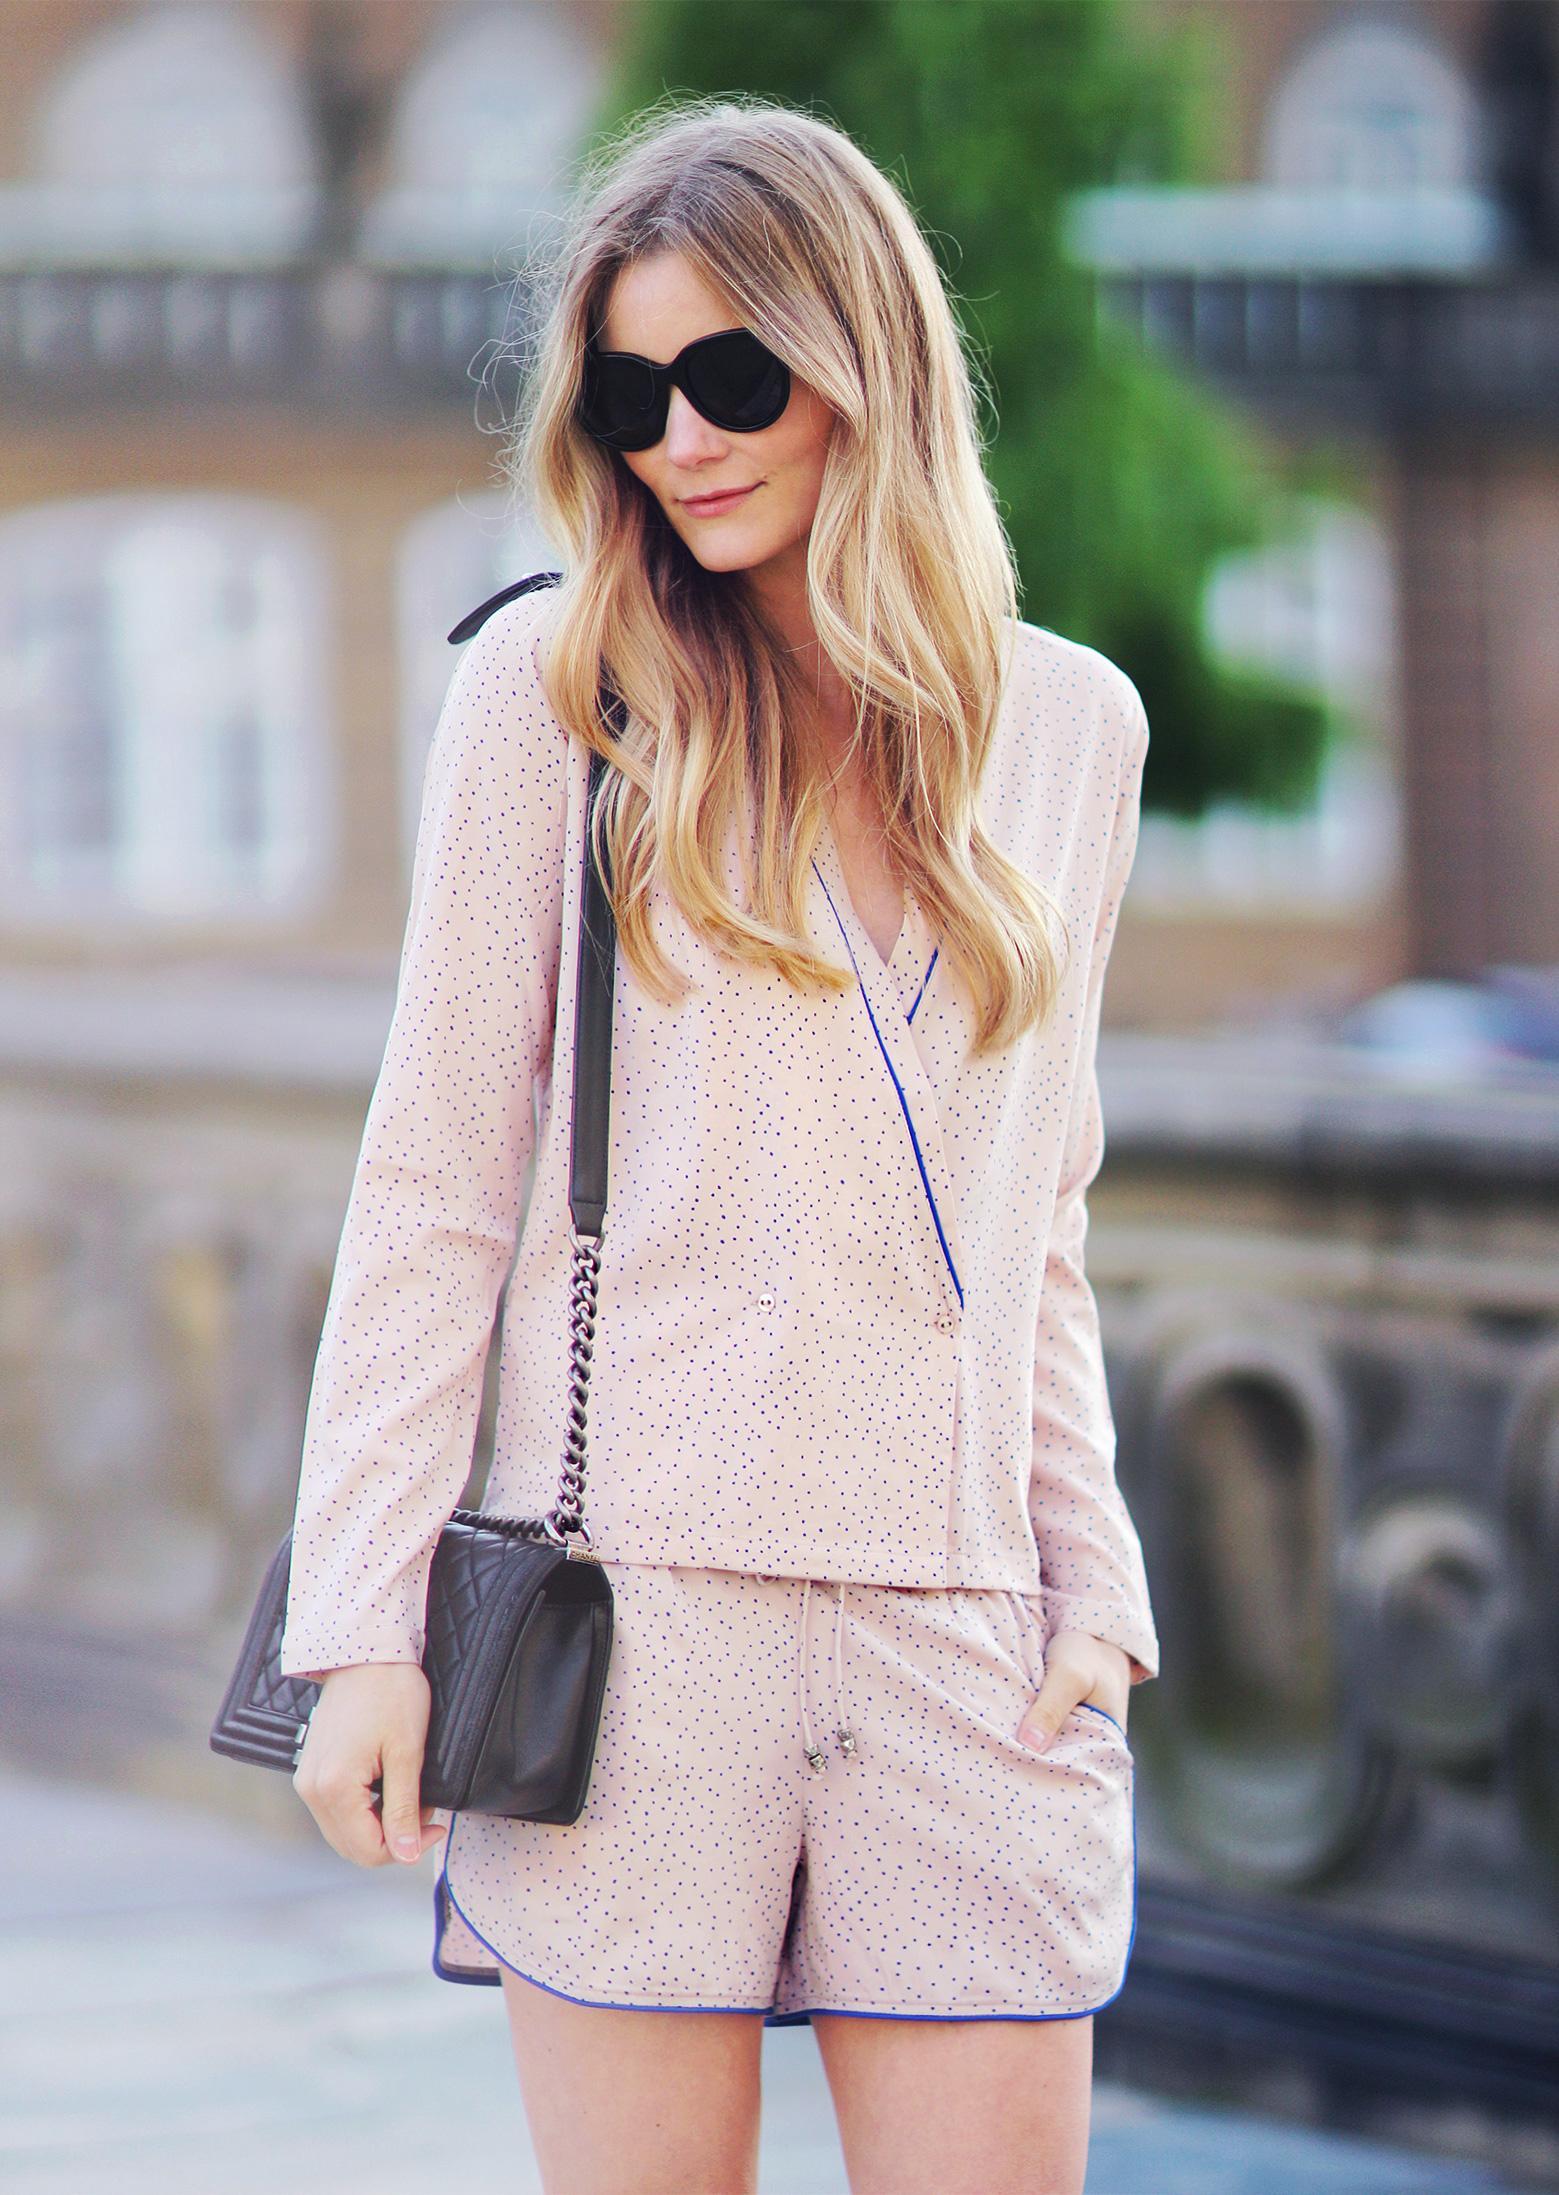 fashion-blogger-denmark@2x